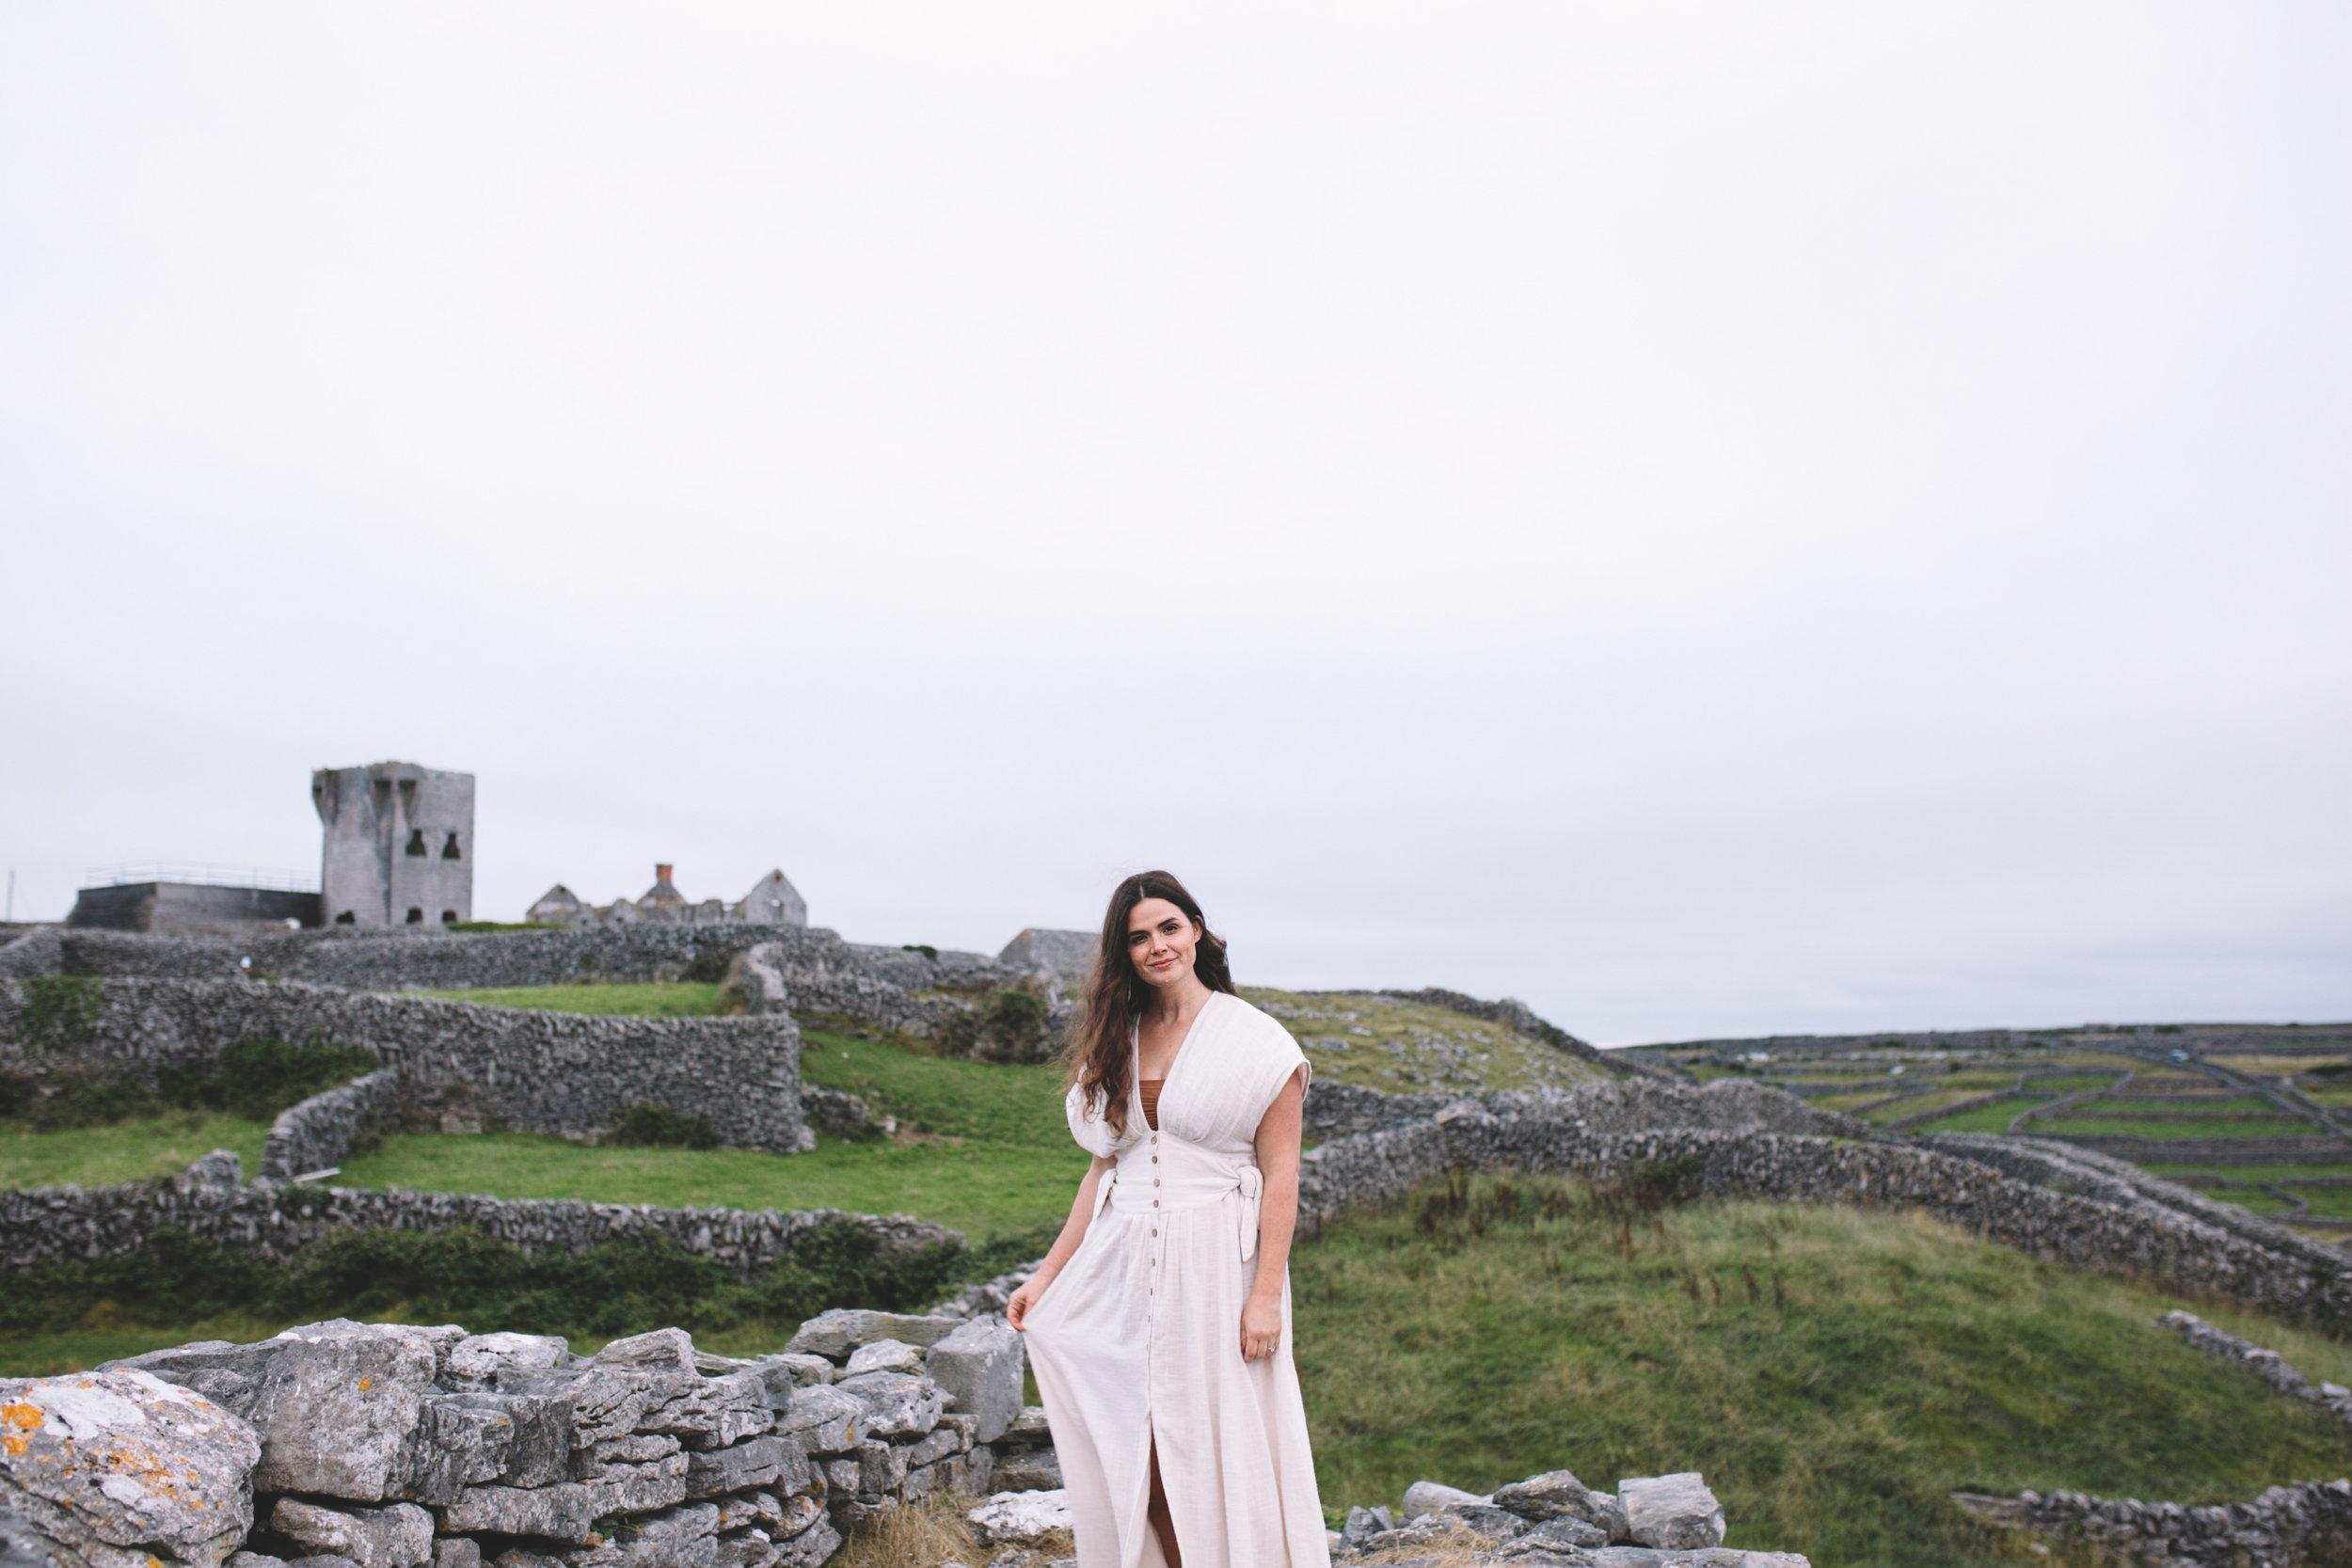 10 Tear Anniversary Trip - Aran Island Inis Mor Inis Orr Ireland  (16 of 73).jpg